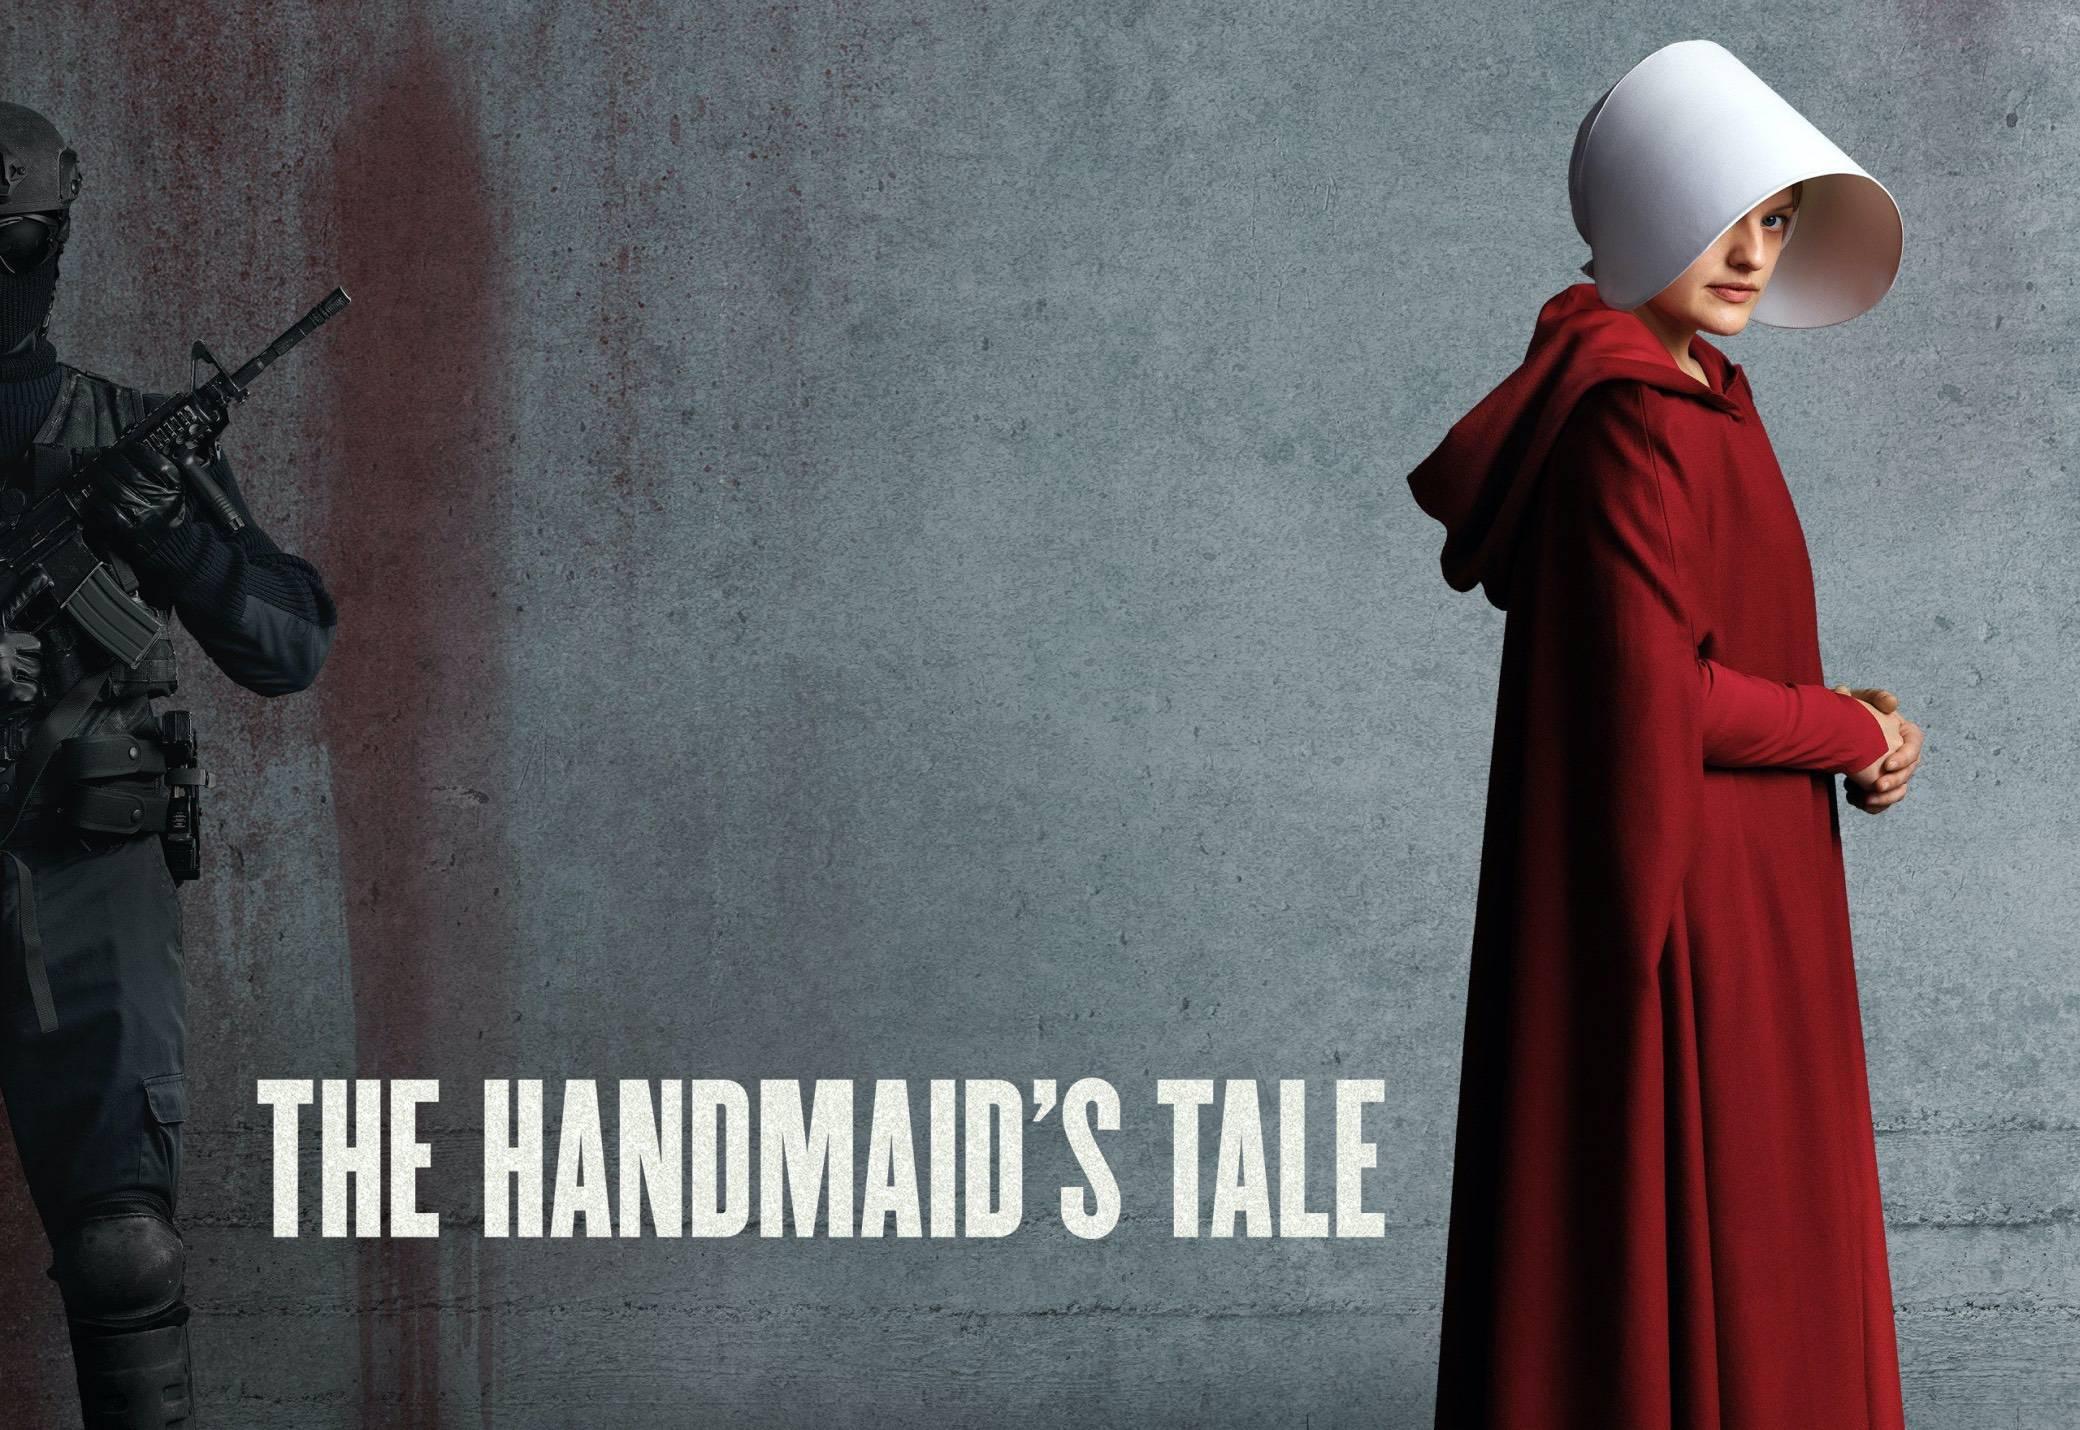 the-handmaids-tale image